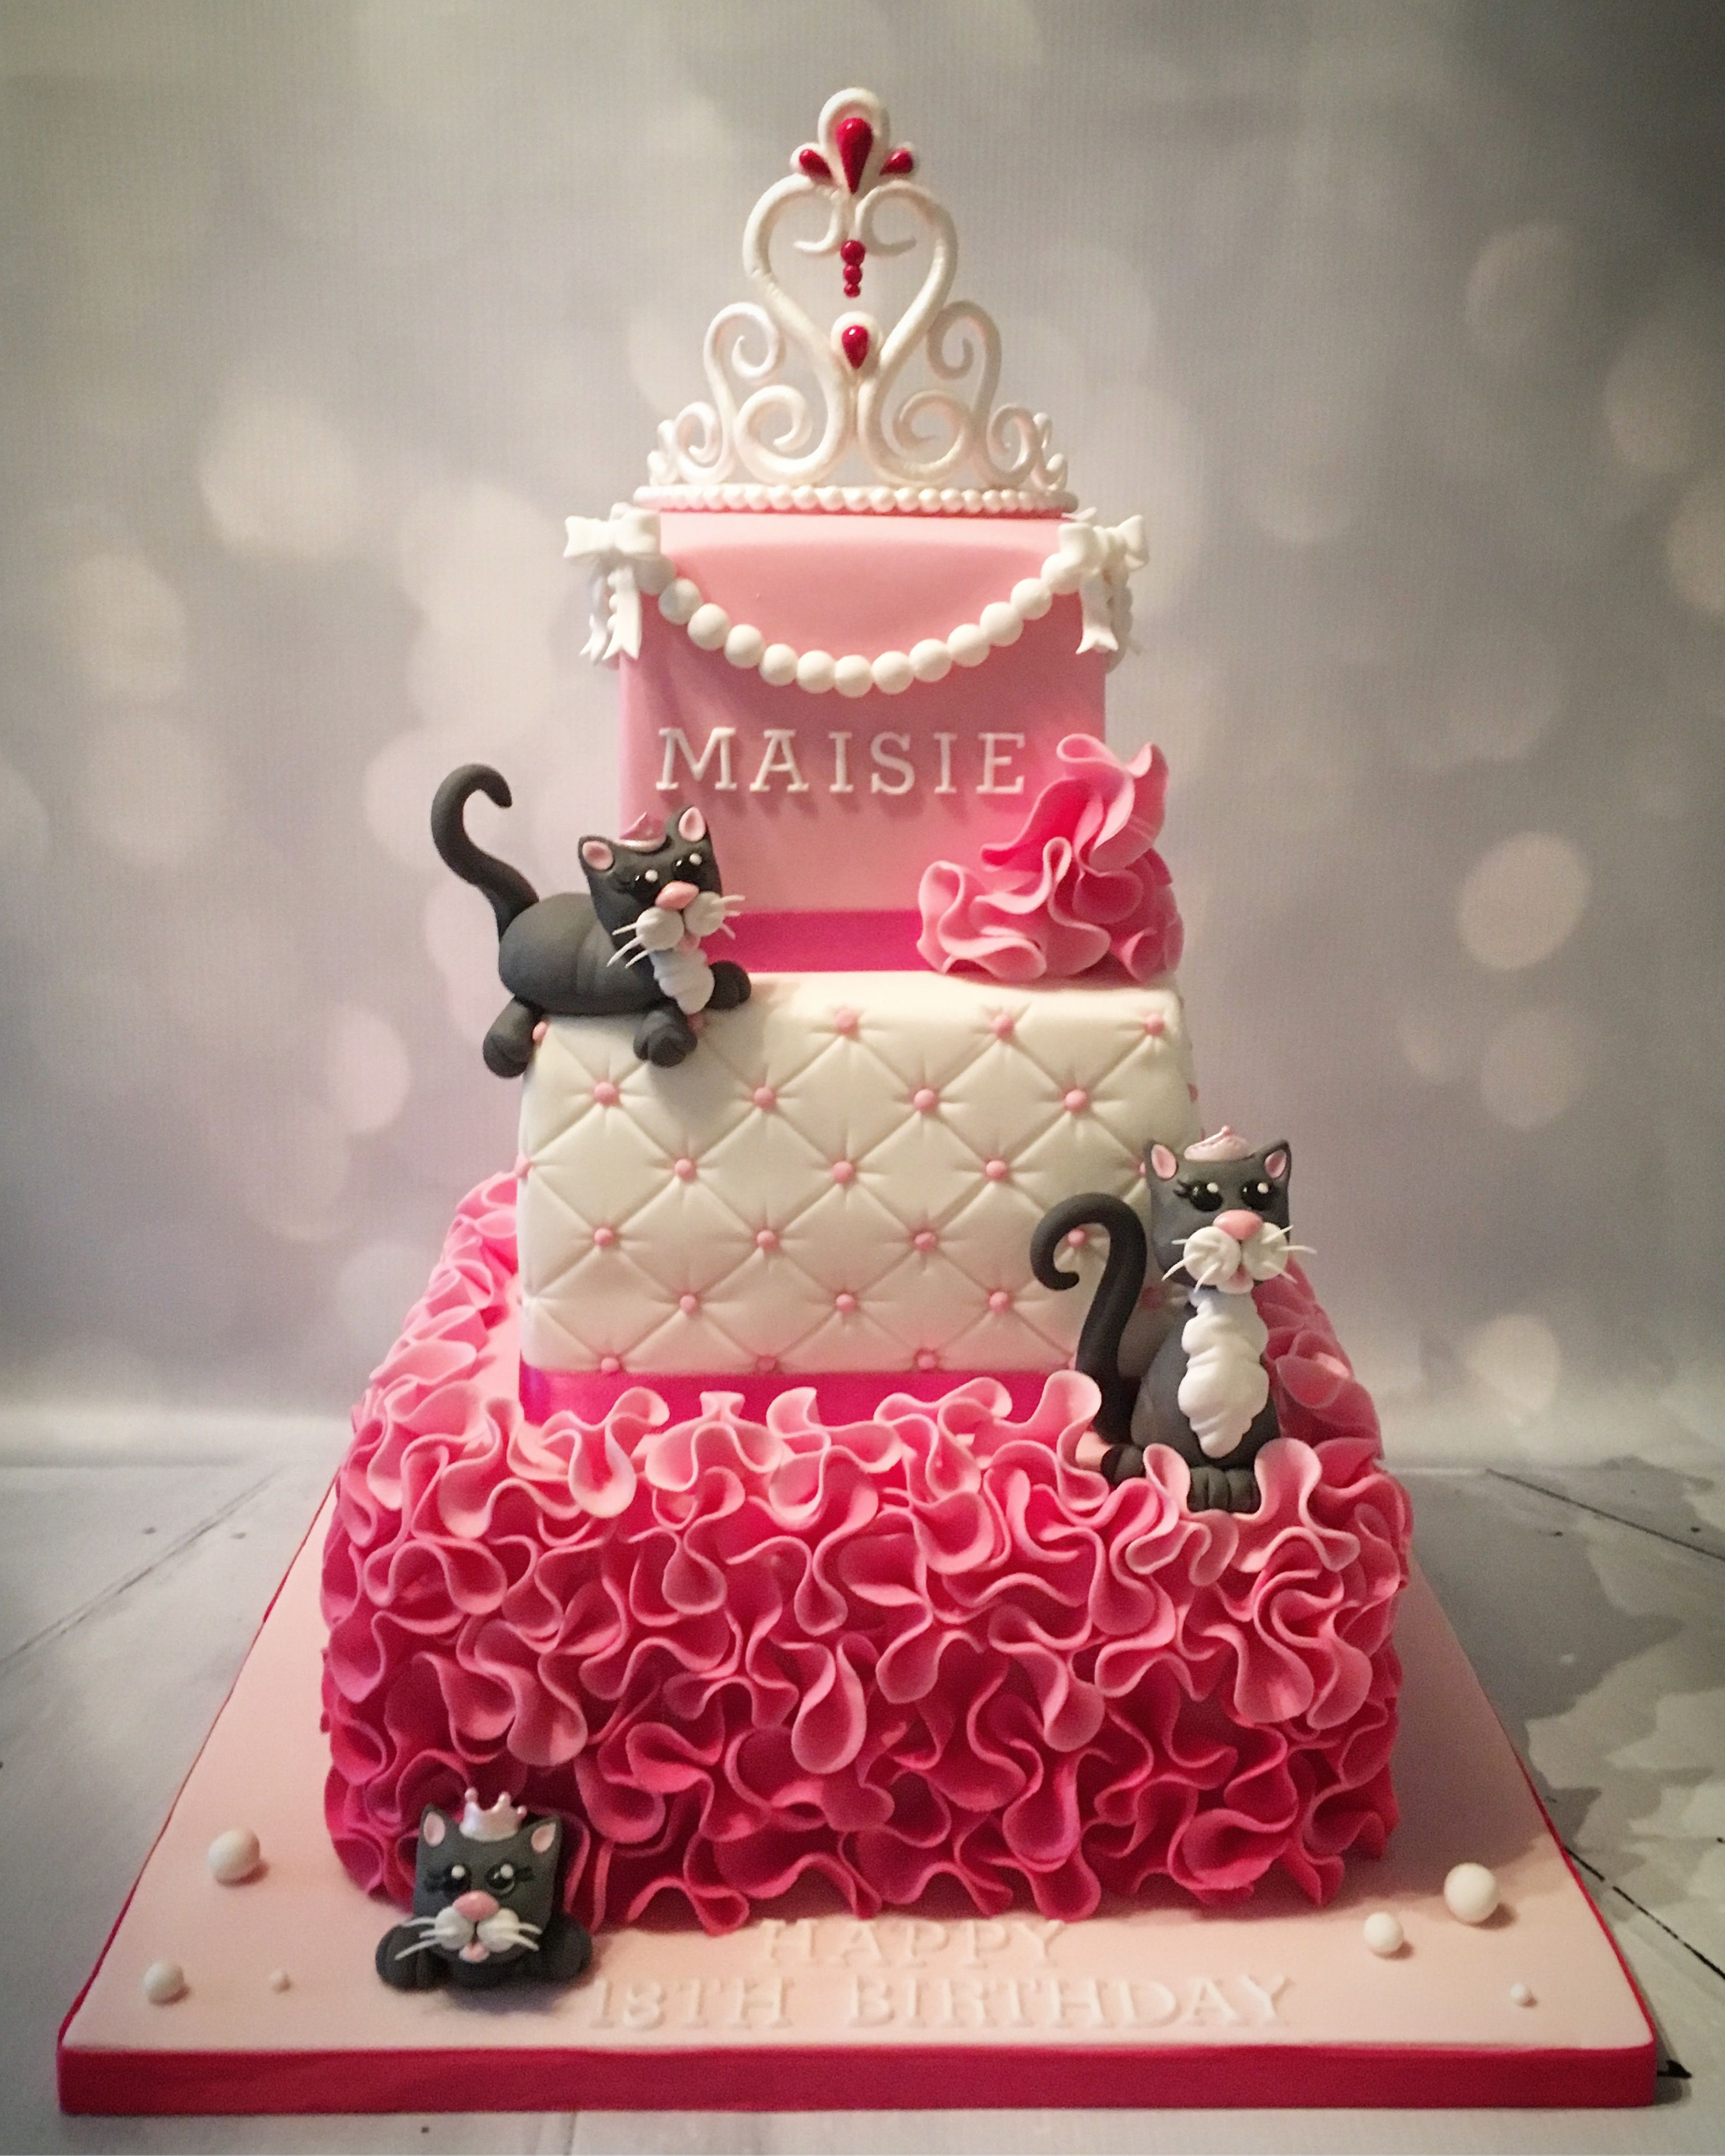 Terrific Princess And Her Cats Birthday Cake Birthday Cakes Birthday Funny Birthday Cards Online Ioscodamsfinfo